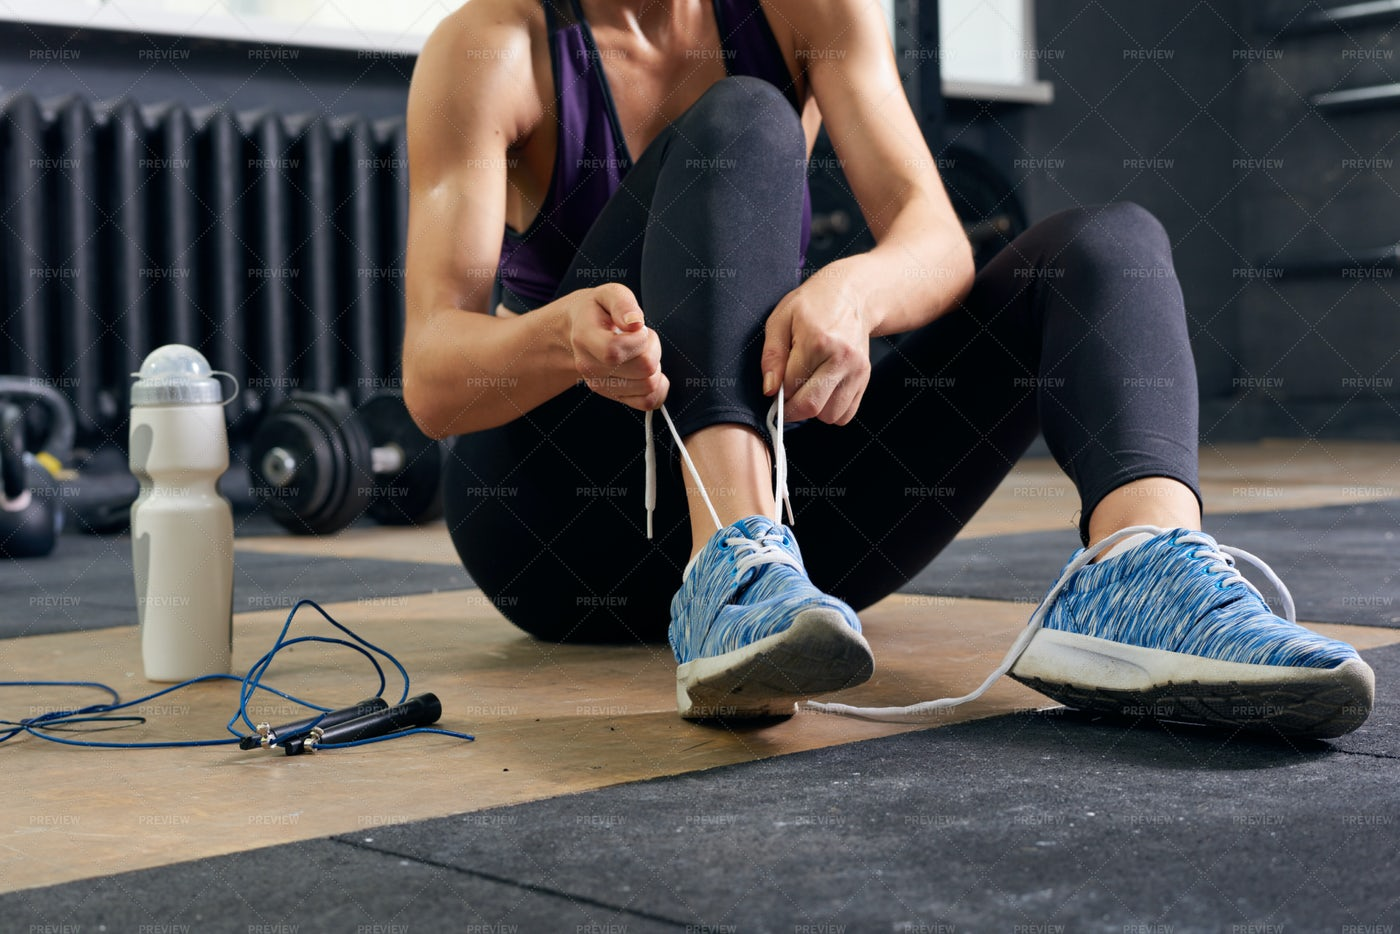 Sportswoman Tying Shoes Close Up: Stock Photos